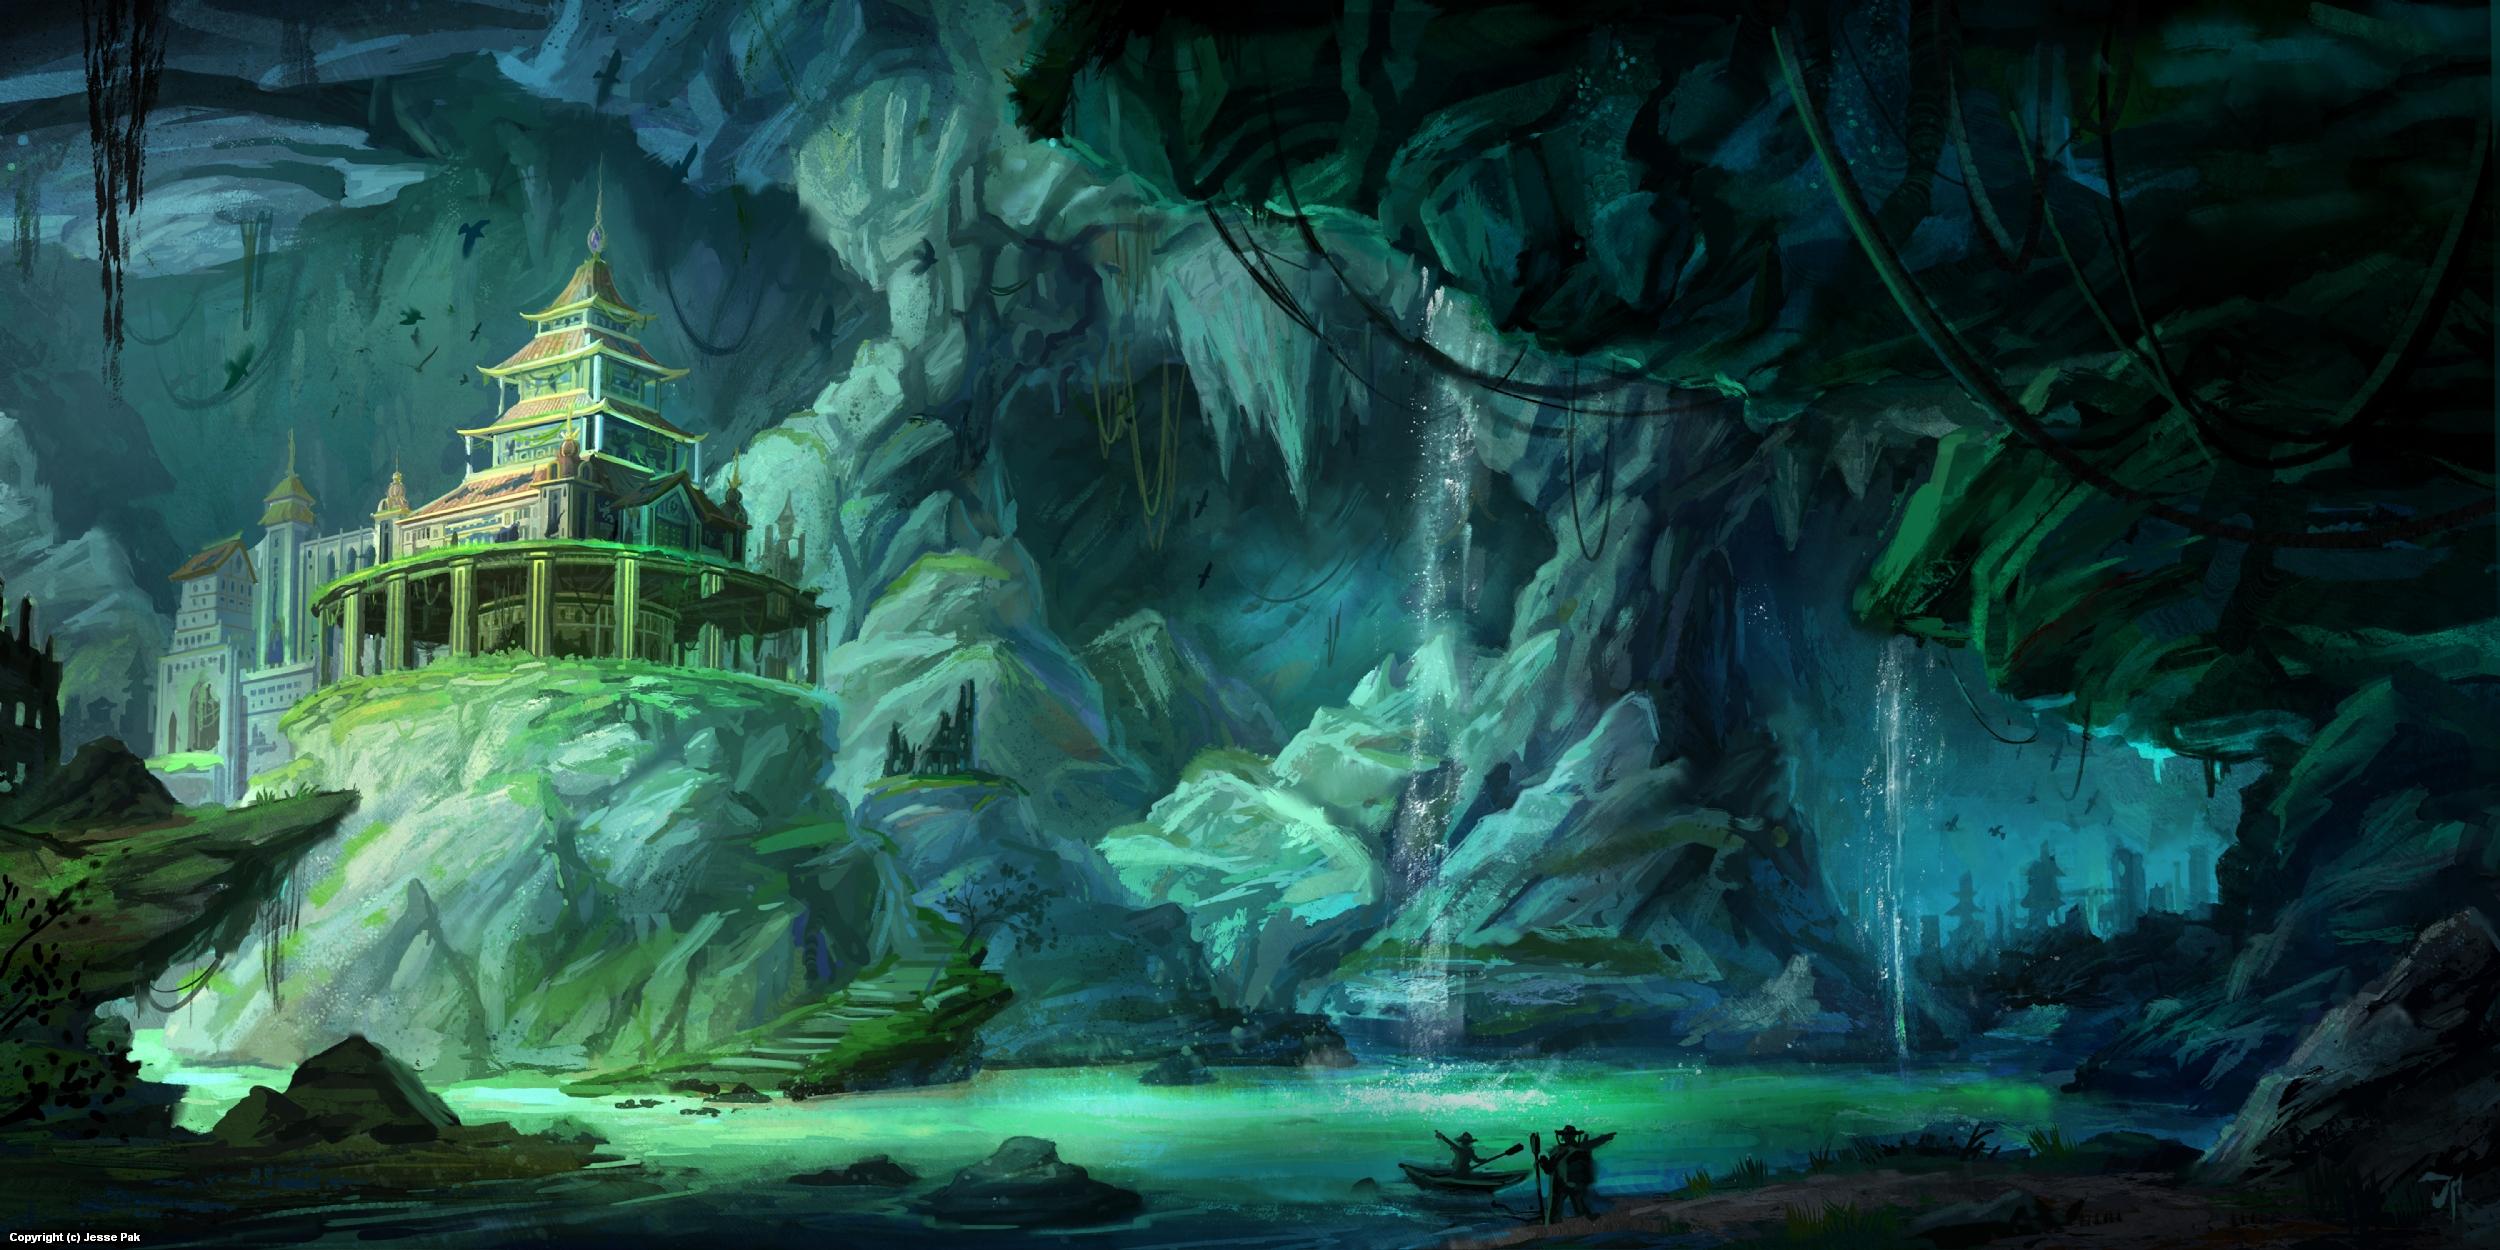 Cavern Ruins Artwork by Jesse Pak